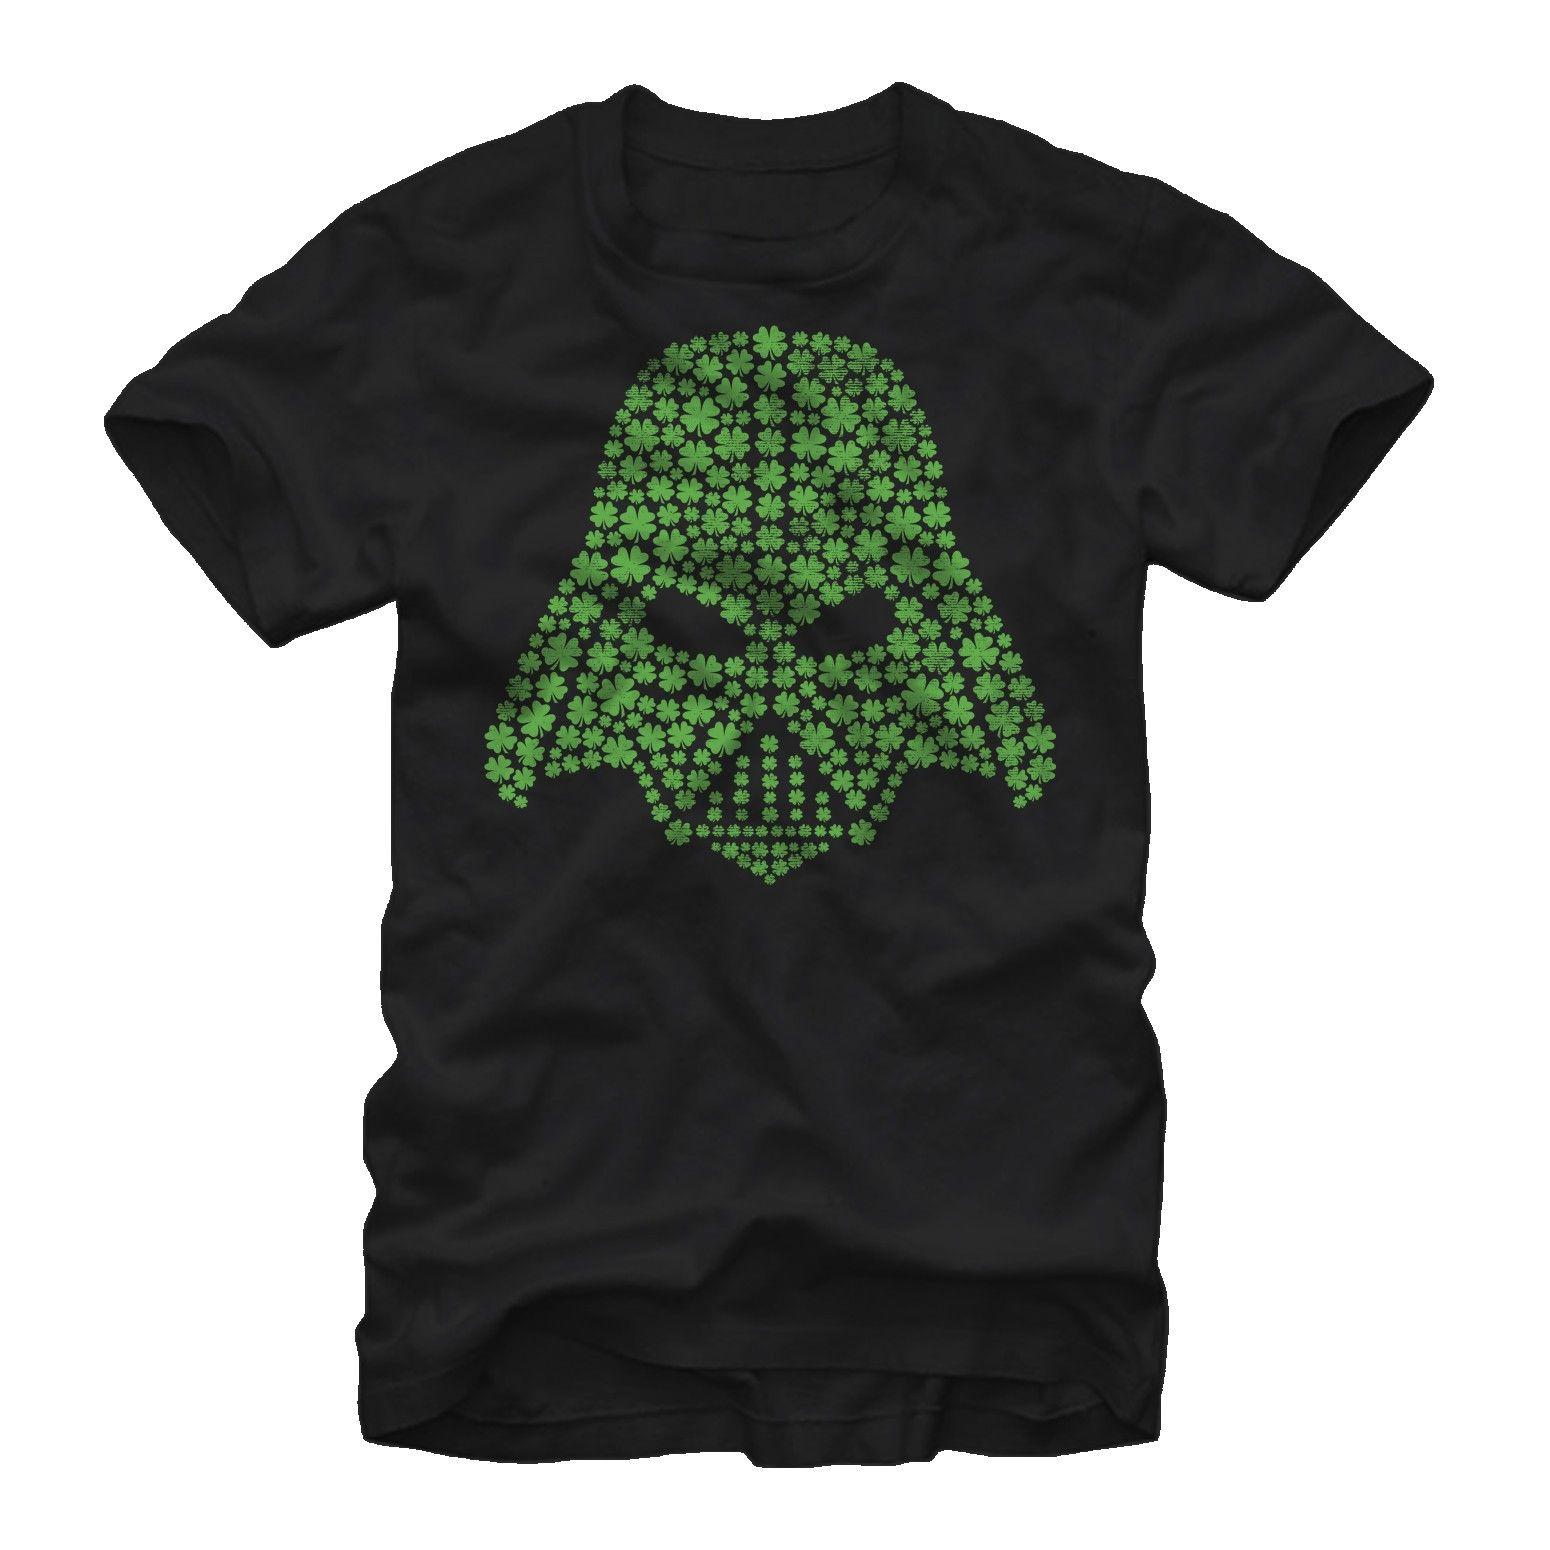 Star Wars Men S Shamrock Darth Vader T Shirt Black Darth Vader T Shirt Star Wars Tshirt Movie T Shirts [ 1550 x 1550 Pixel ]